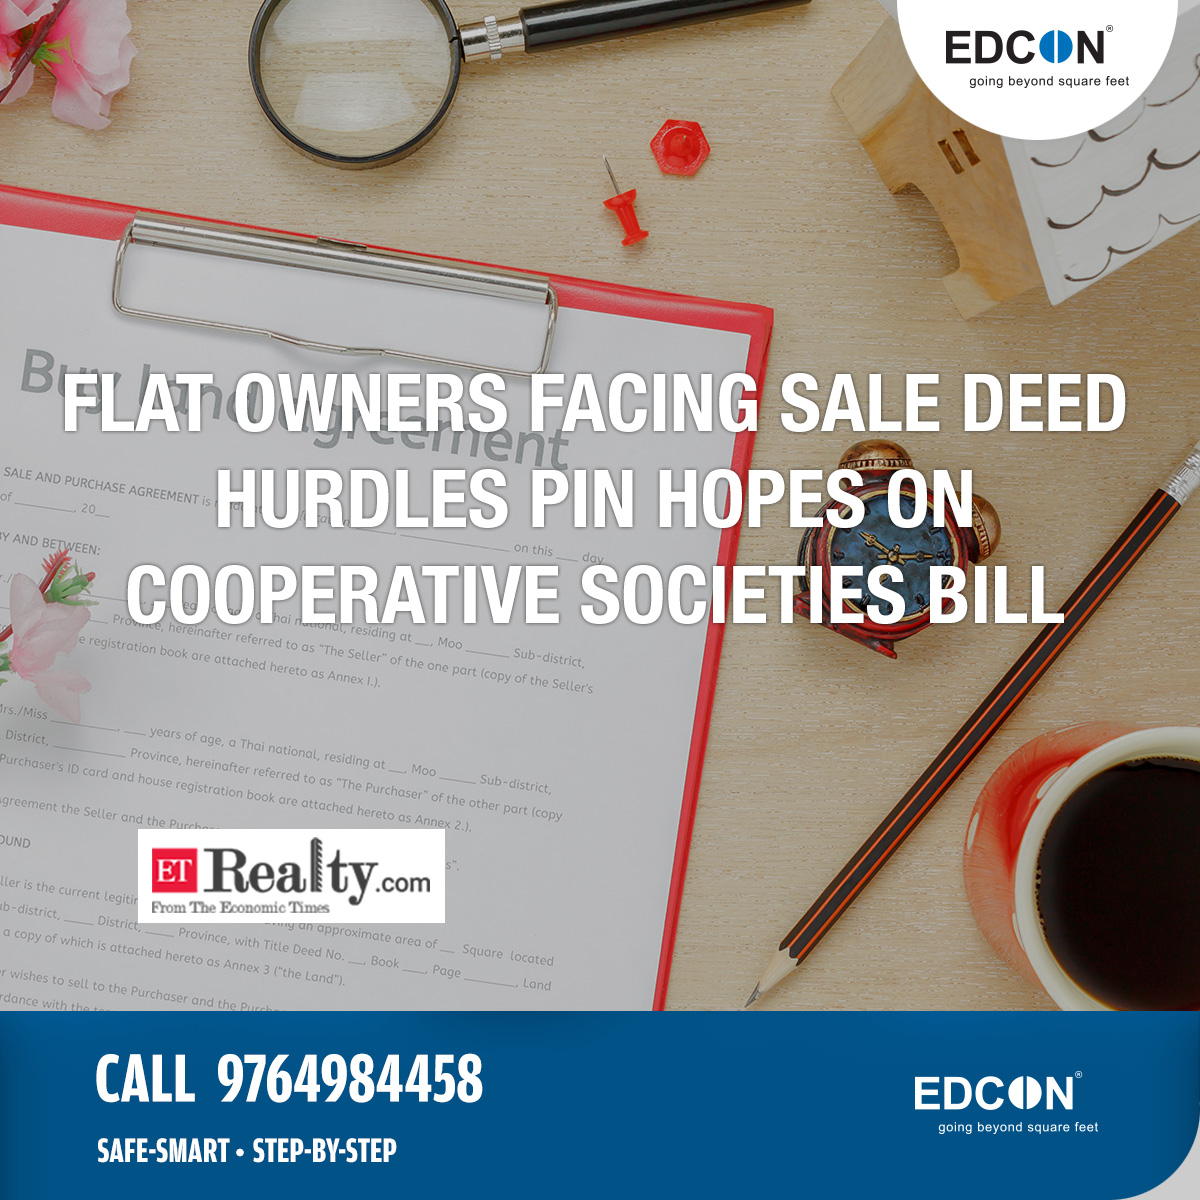 Flat owners facing sale deed hurdles pin hopes on cooperative societies bill